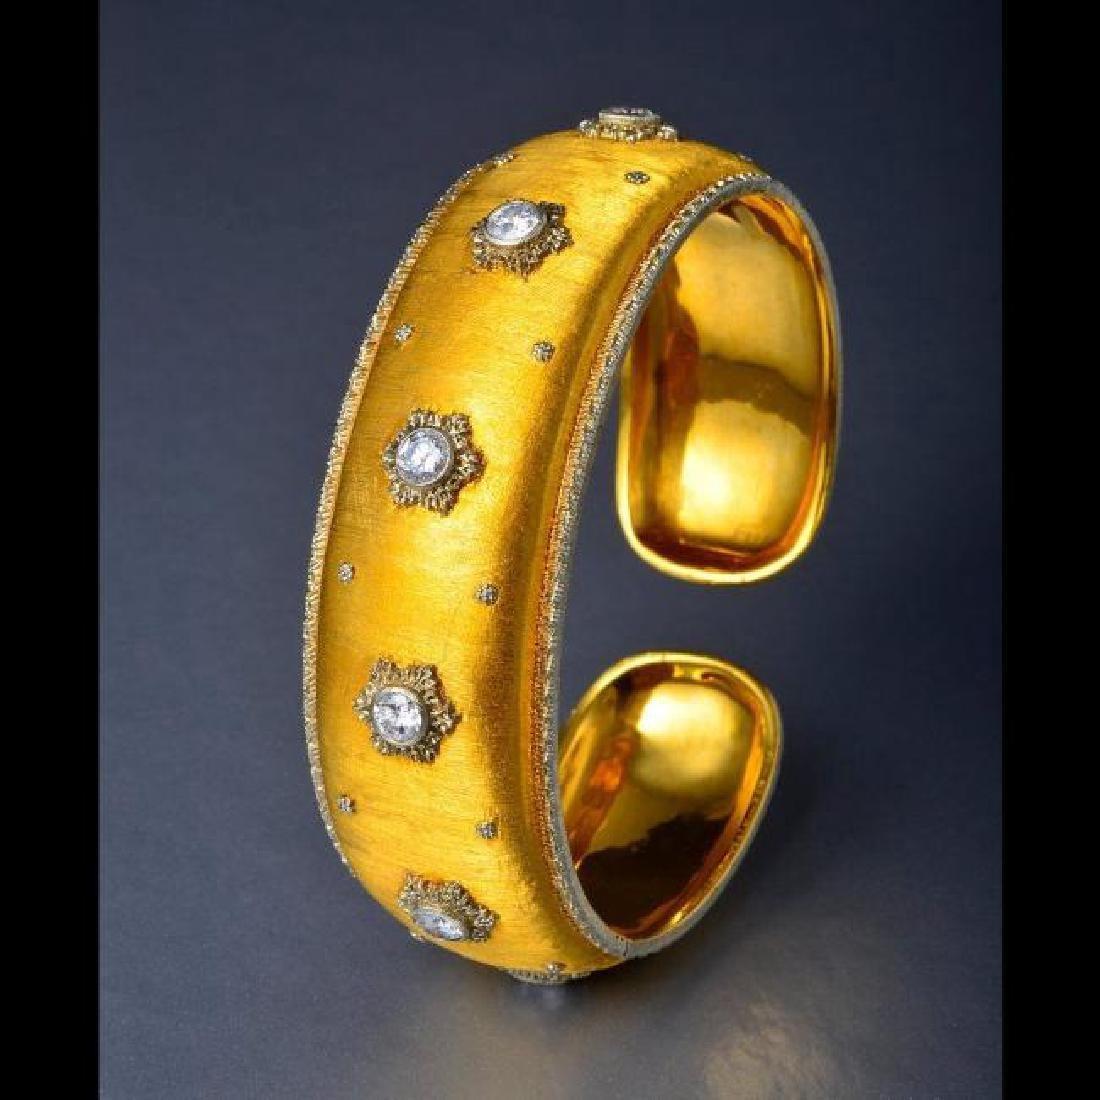 Mario Buccellati 18K Yellow Gold Diamond Bracelet, 2ctw